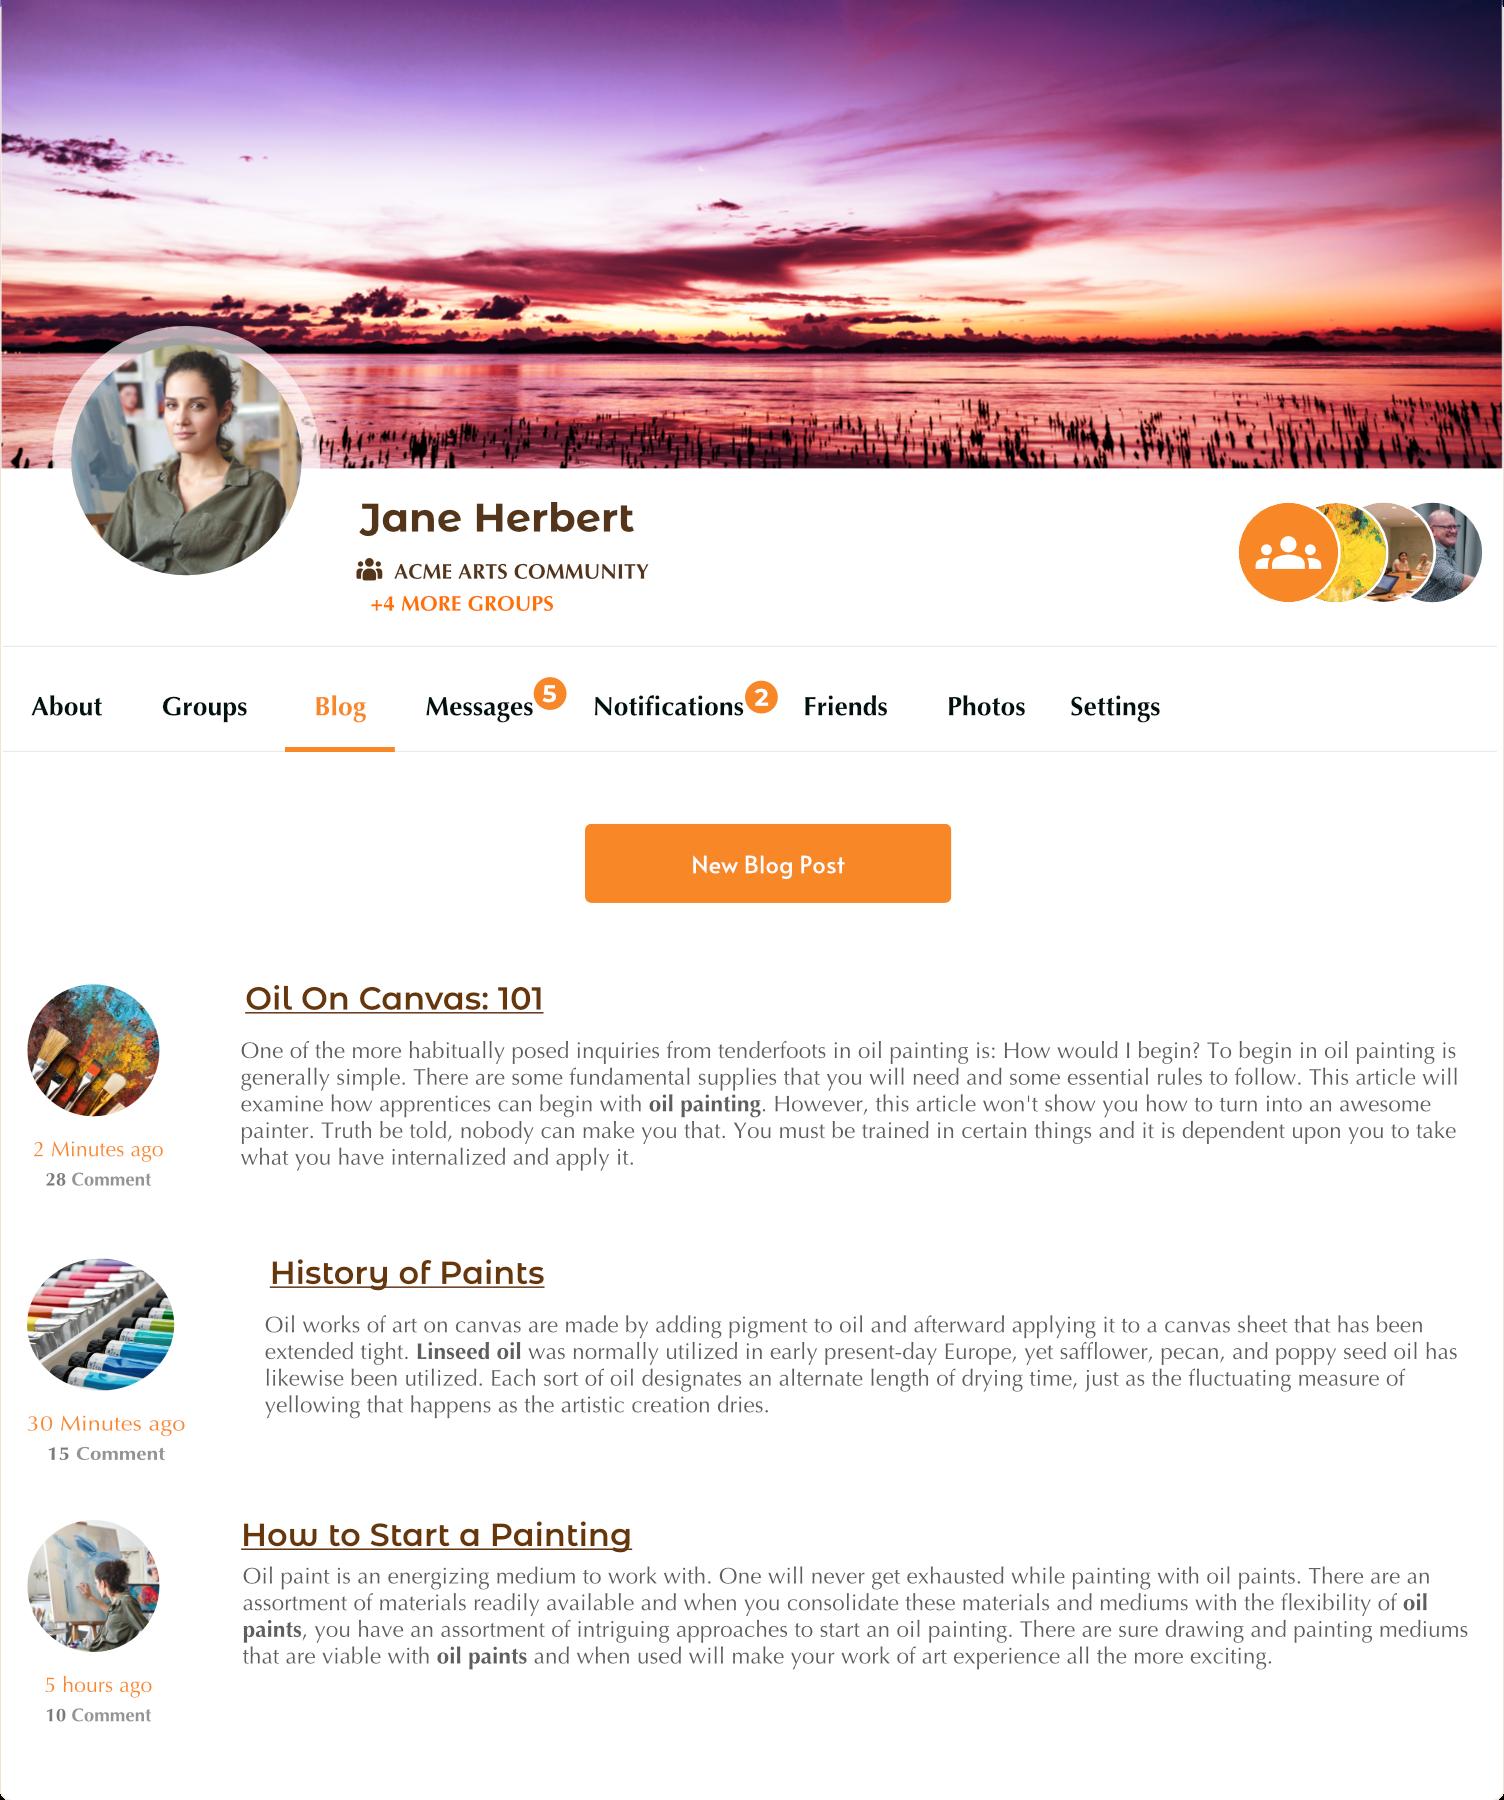 ProfileGrid – User Profiles, Memberships, Groups and Communities